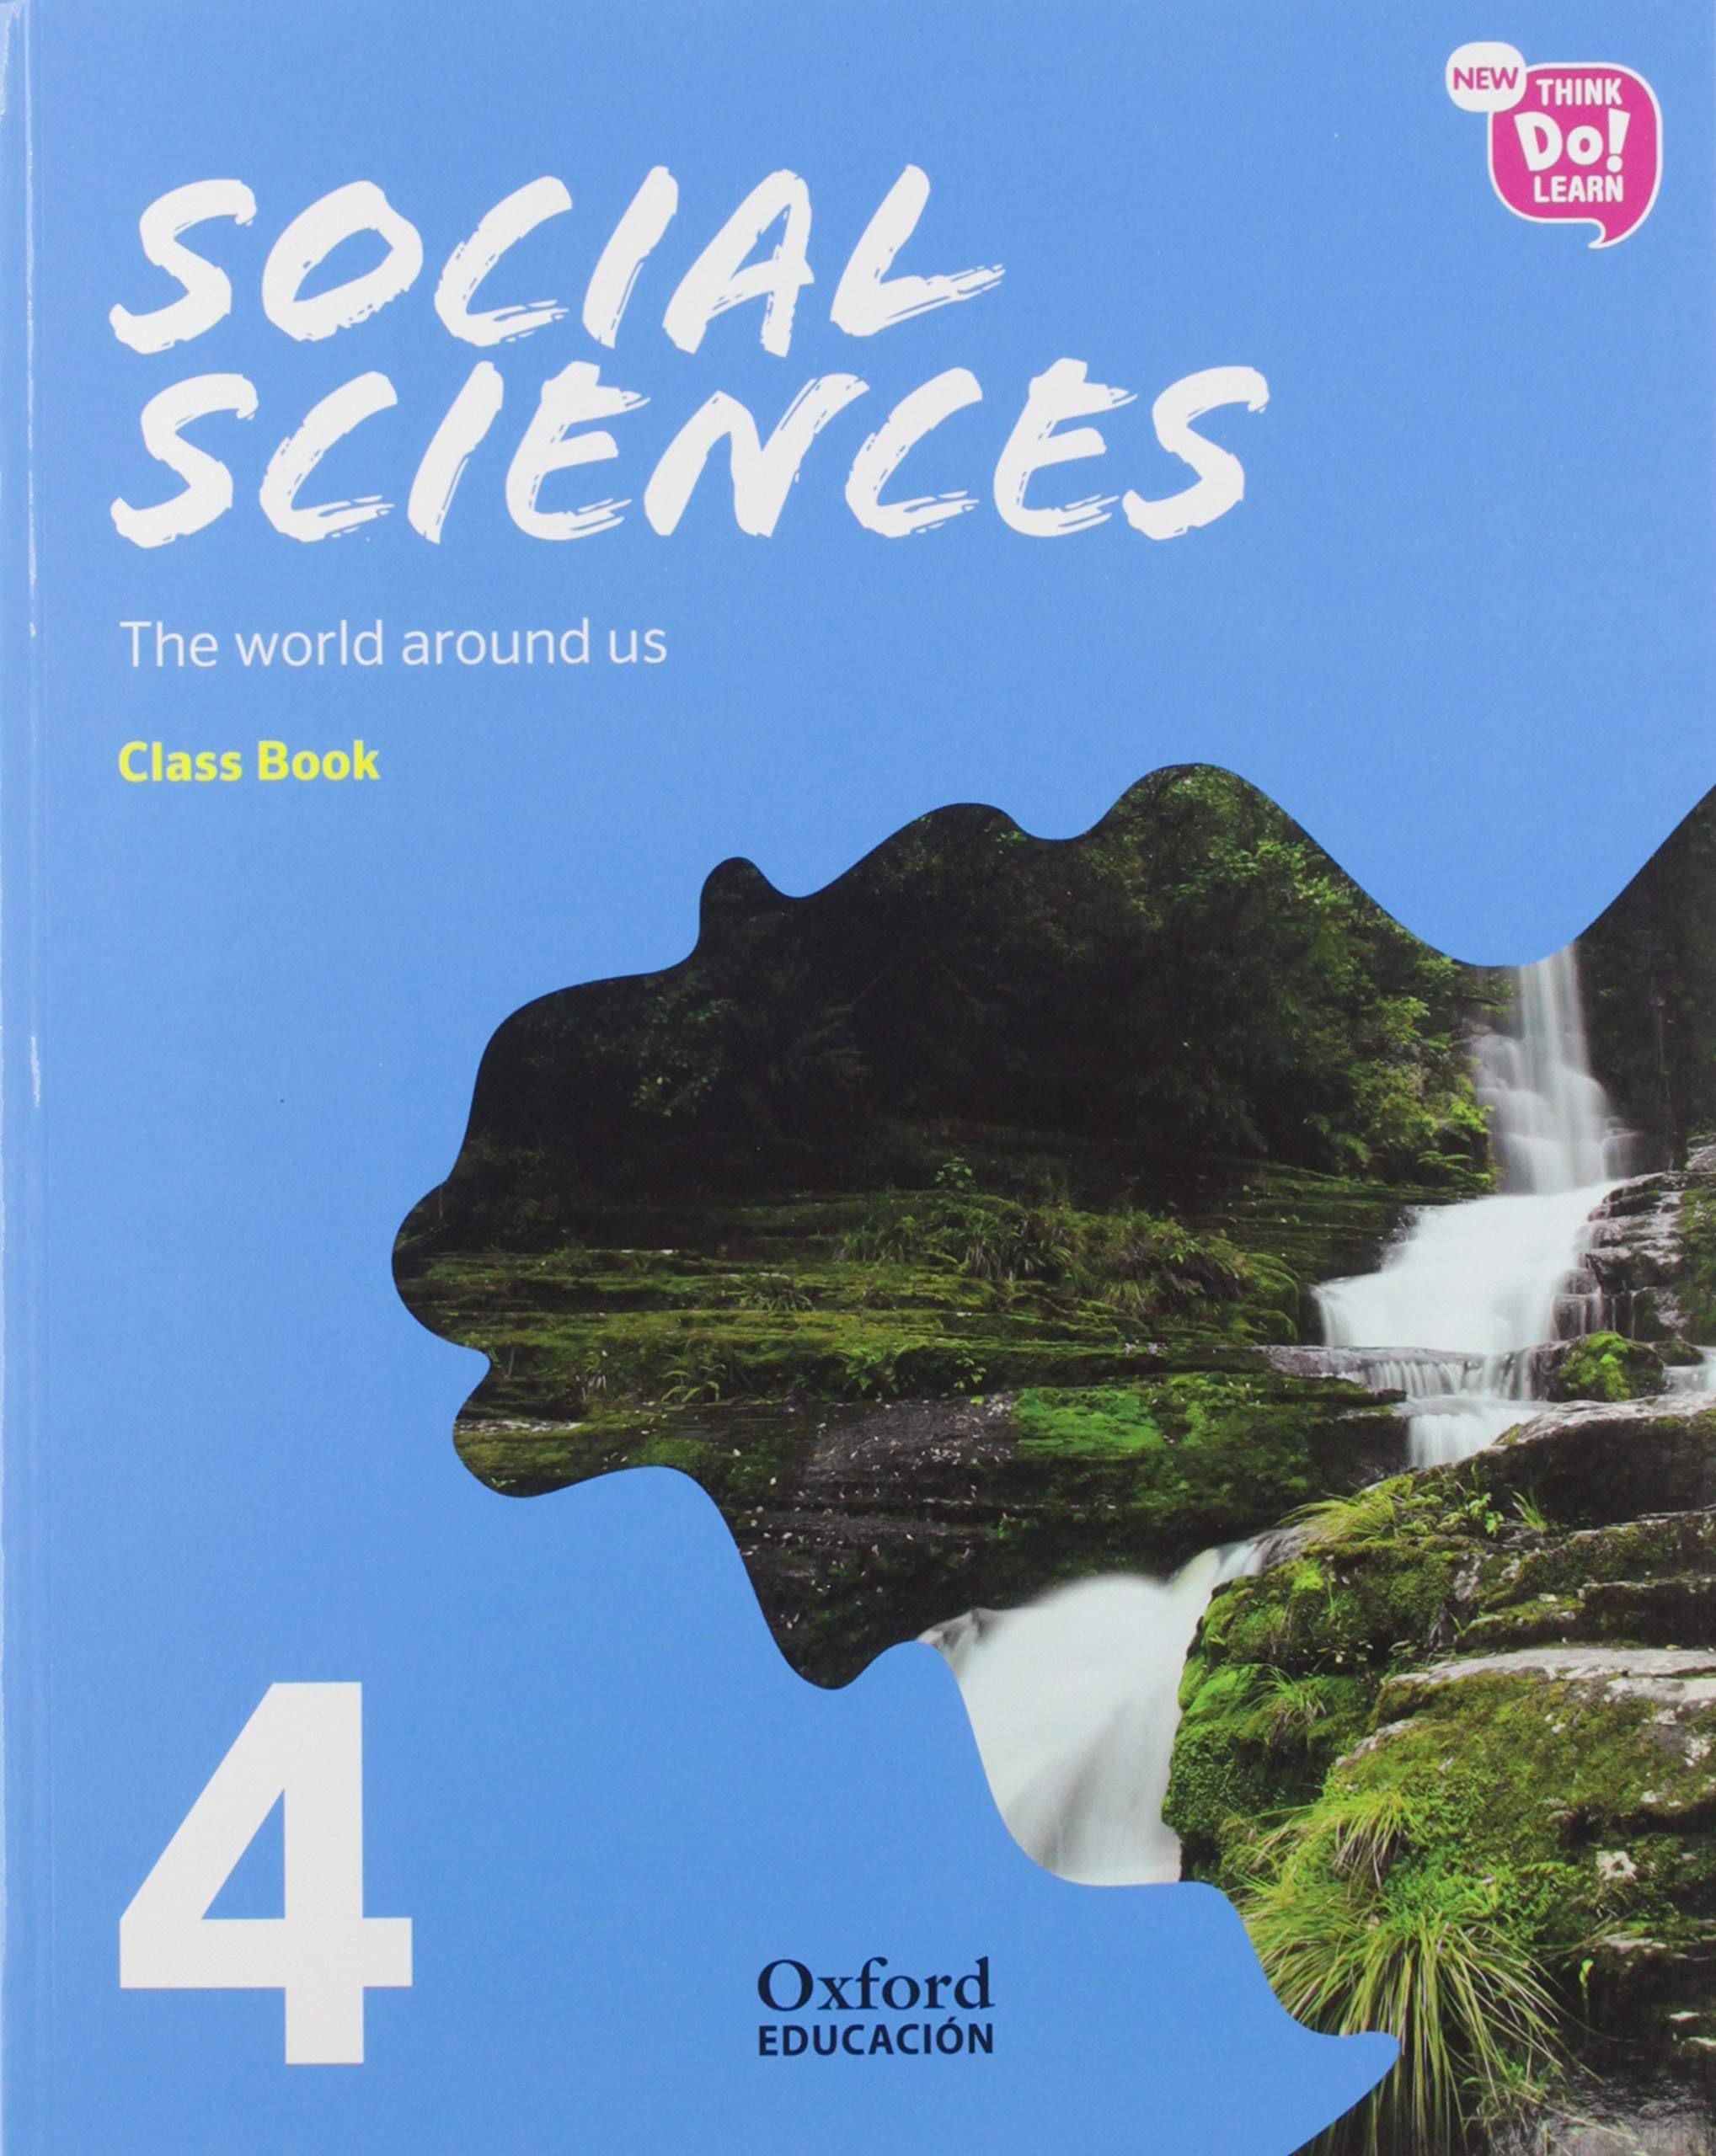 New Think Do Learn Social Sciences 4. Class Book Pack National Edition: Amazon.es: Libros en idiomas extranjeros